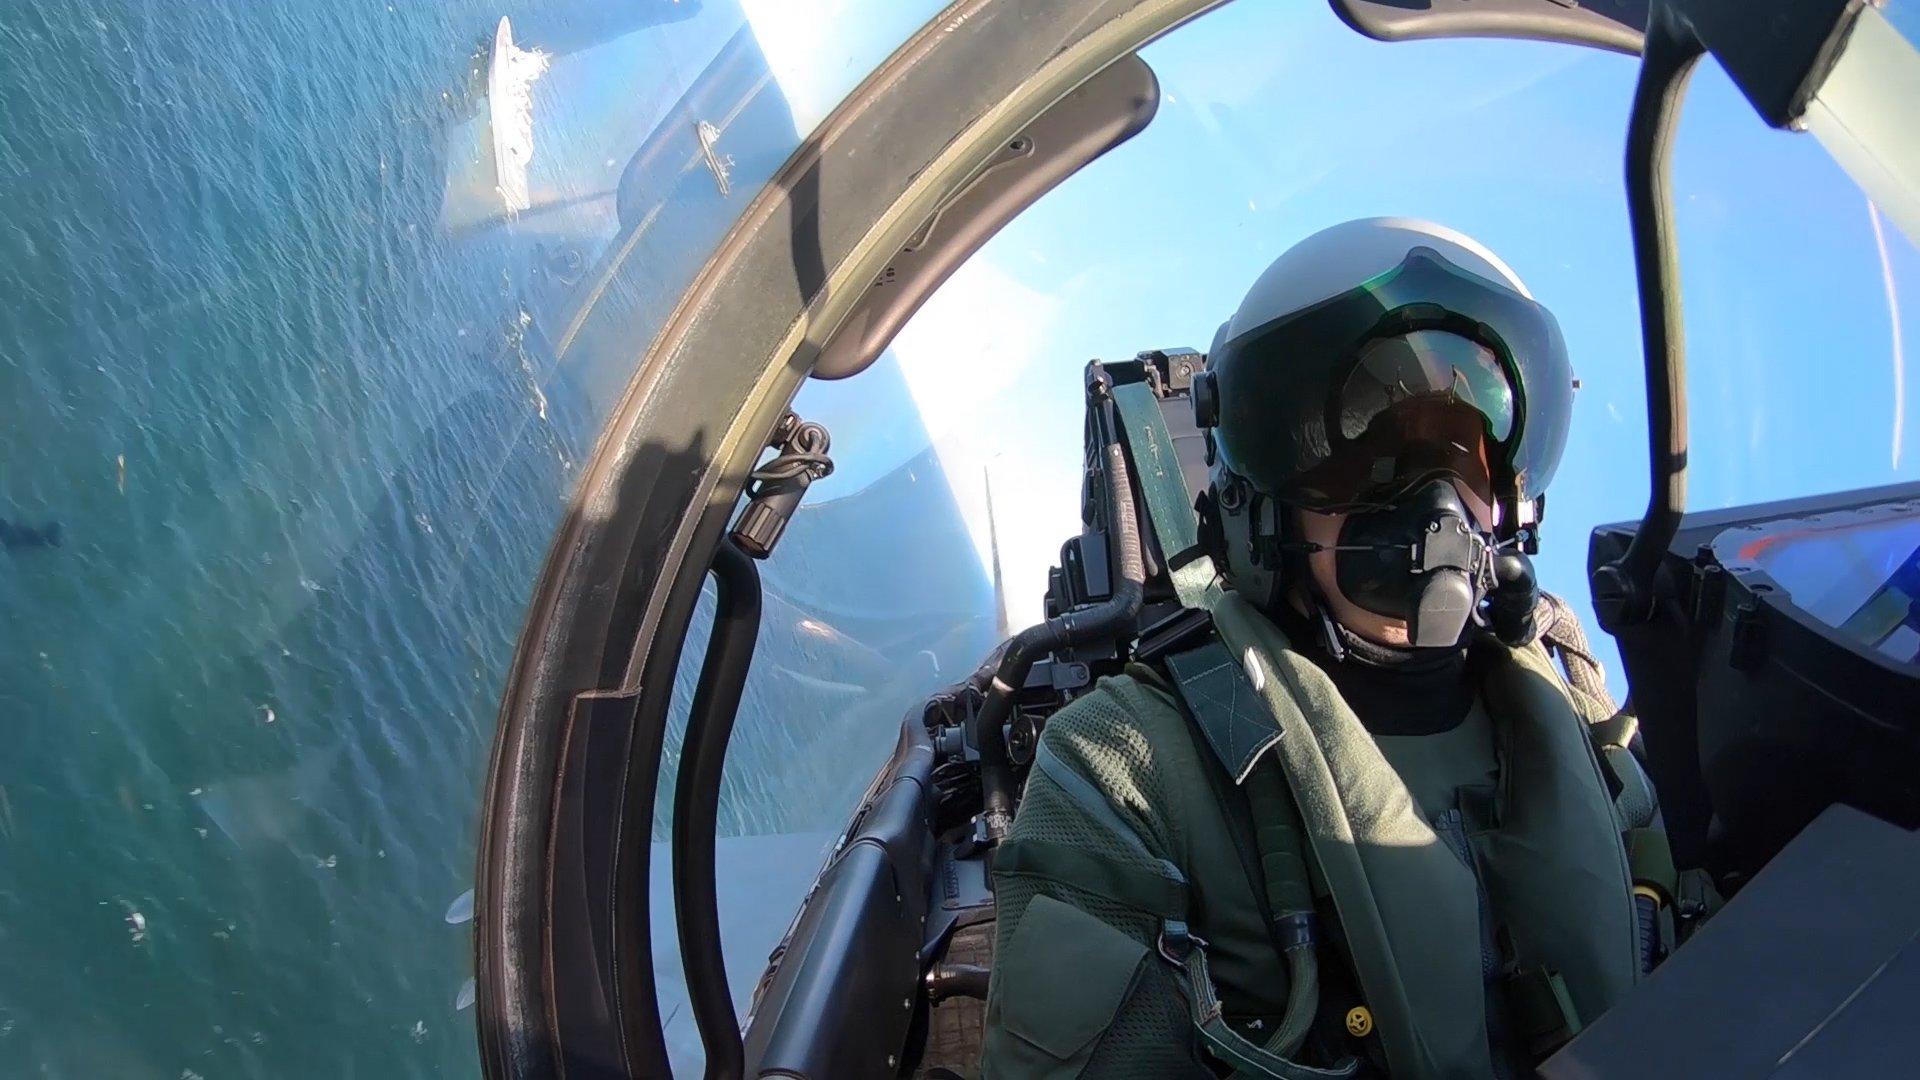 Eurofighter Typhoon pilot [MoD Crown Copyright/Royal Air Force]